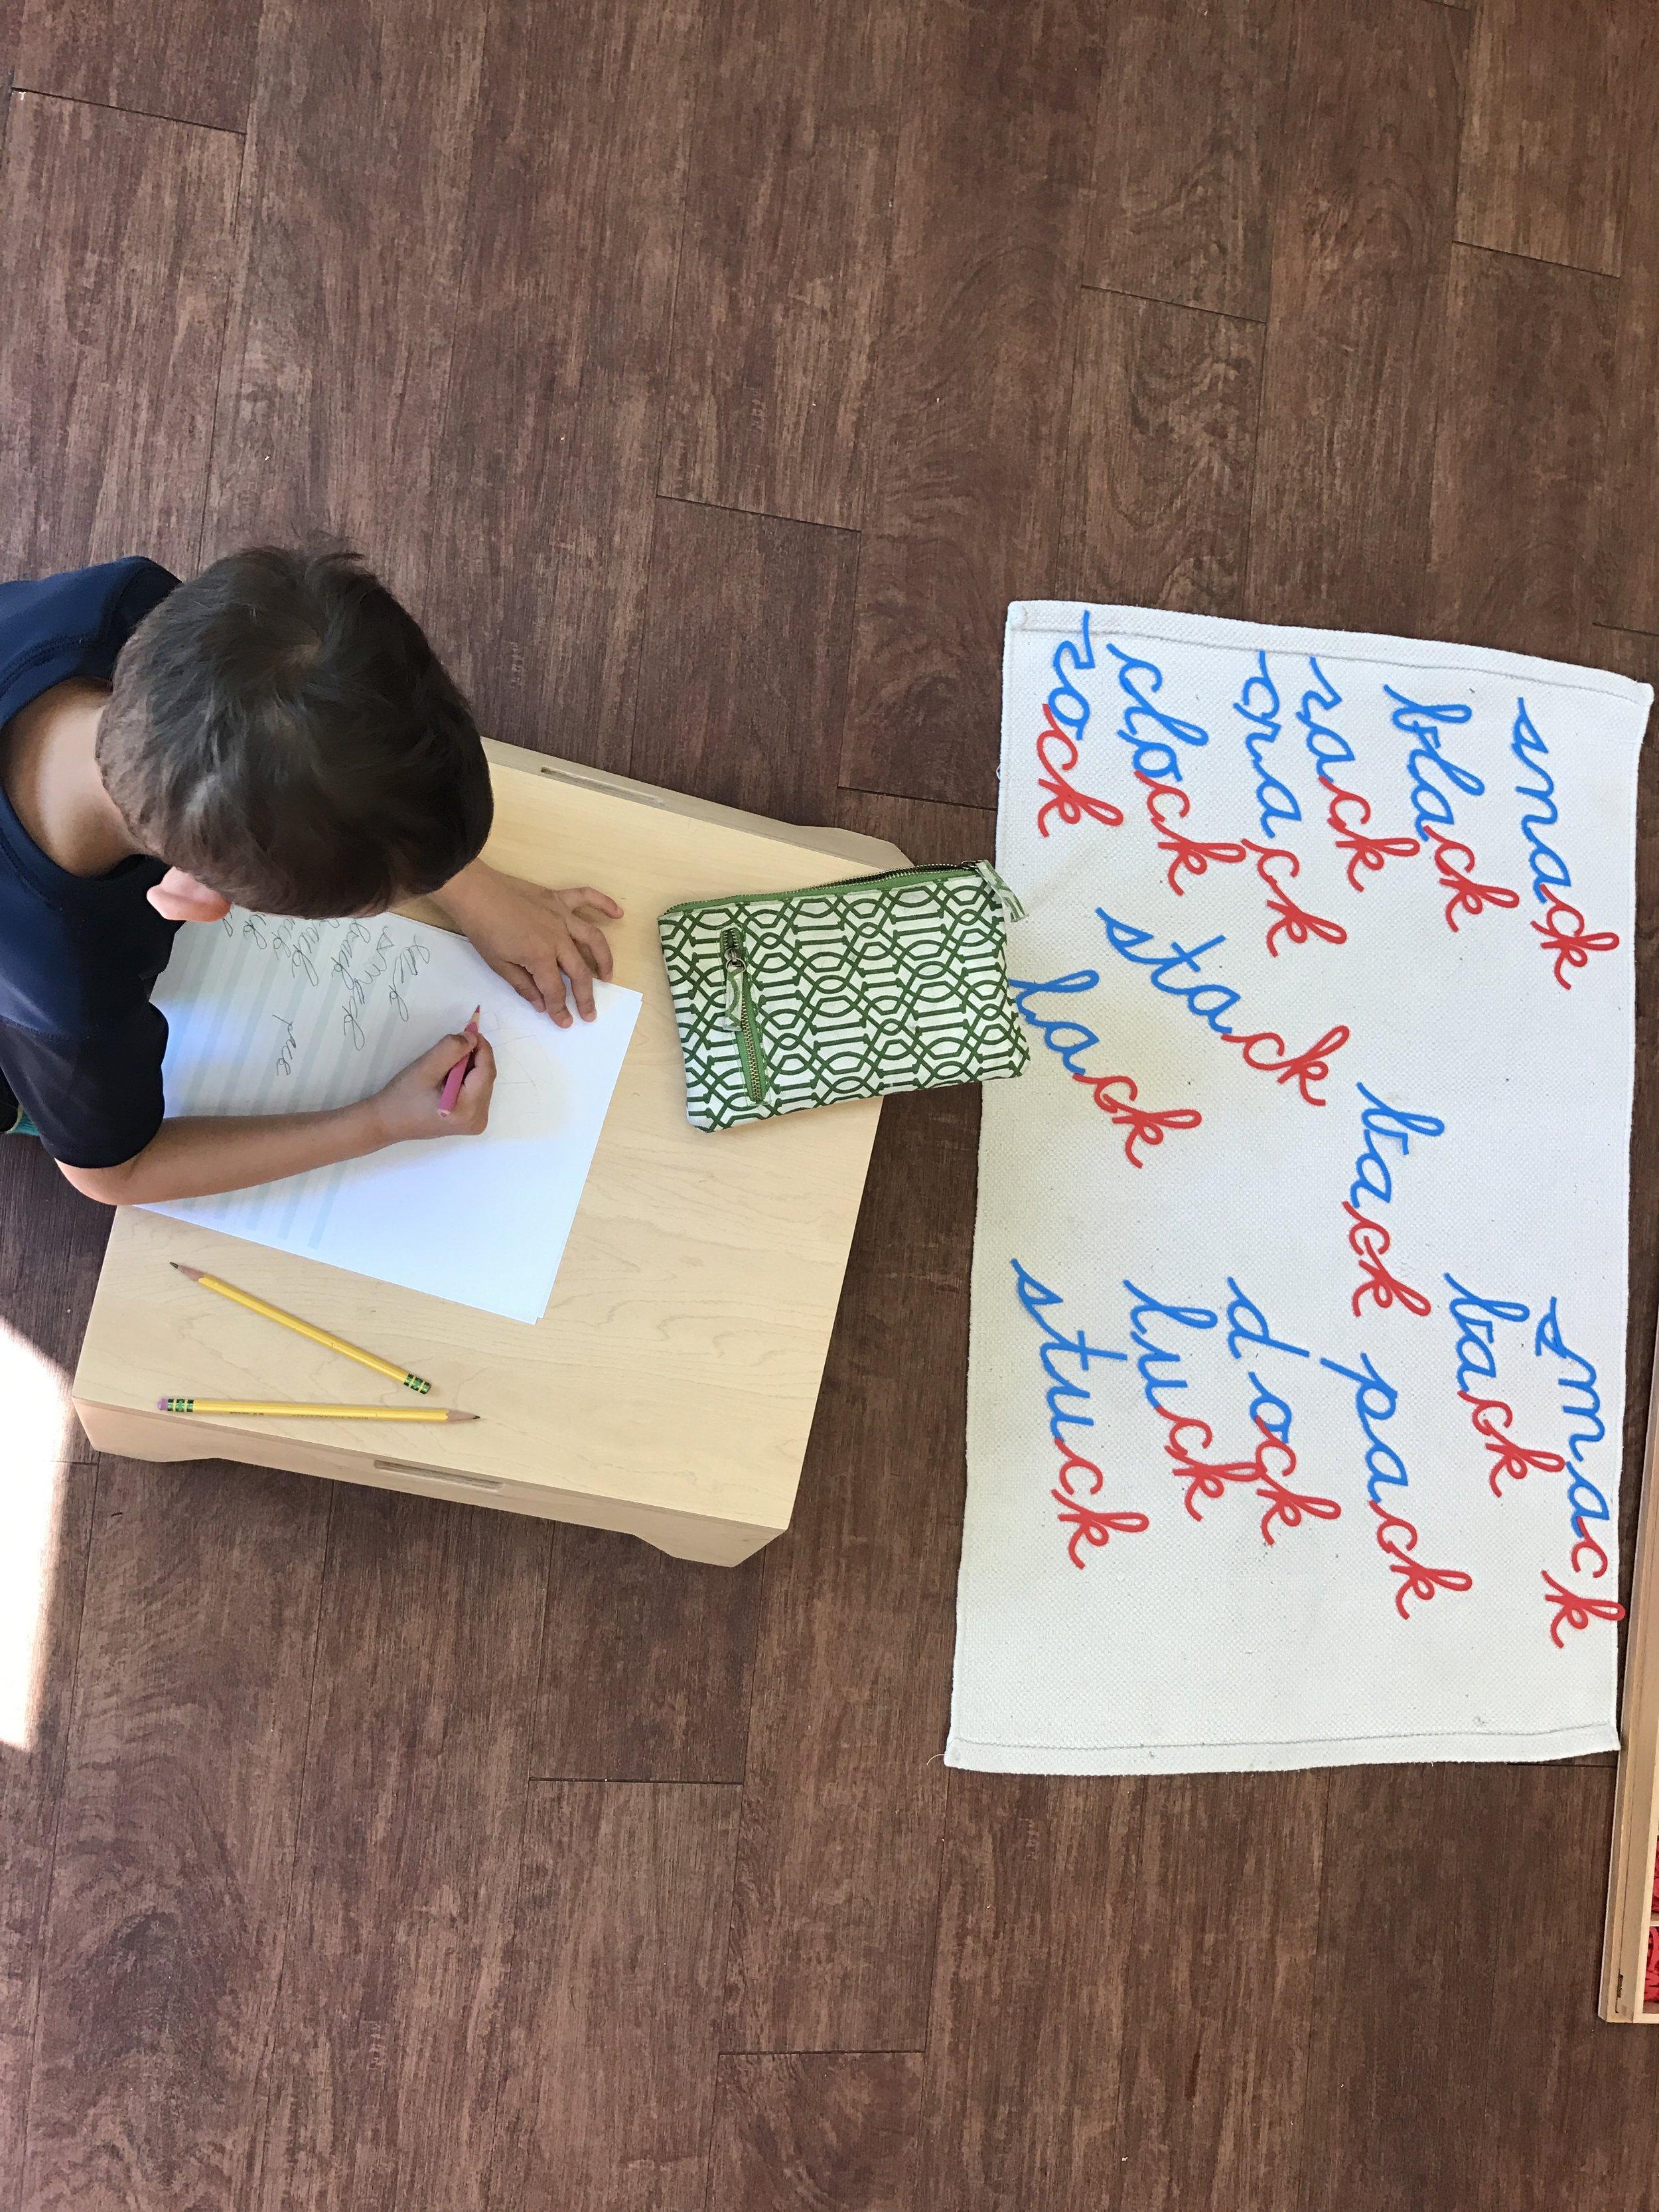 Spelling through movement